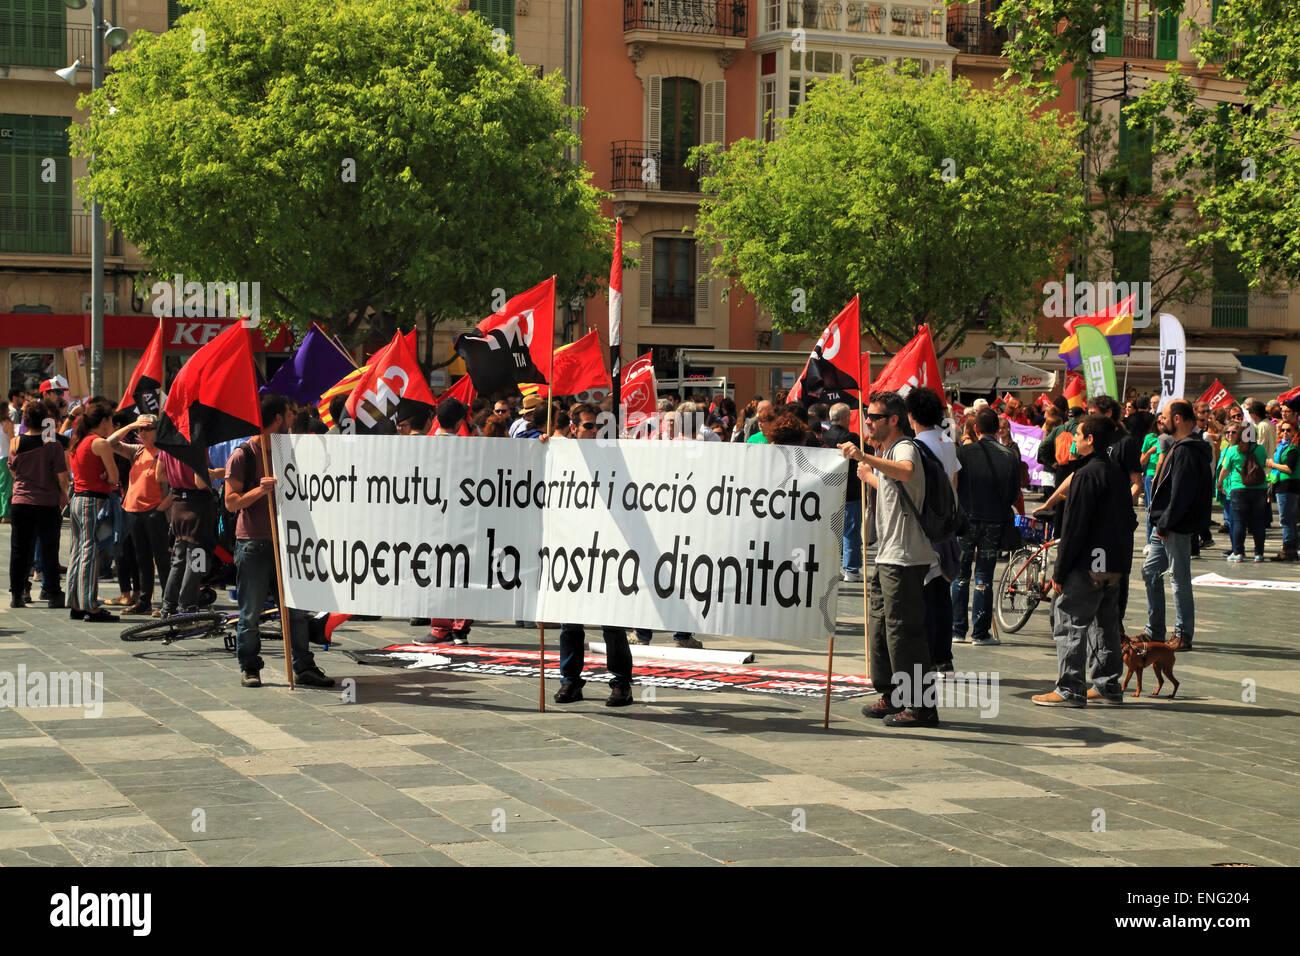 Labour Day street demonstration on 1 May, Palma, Mallorca Island, Spain - Stock Image